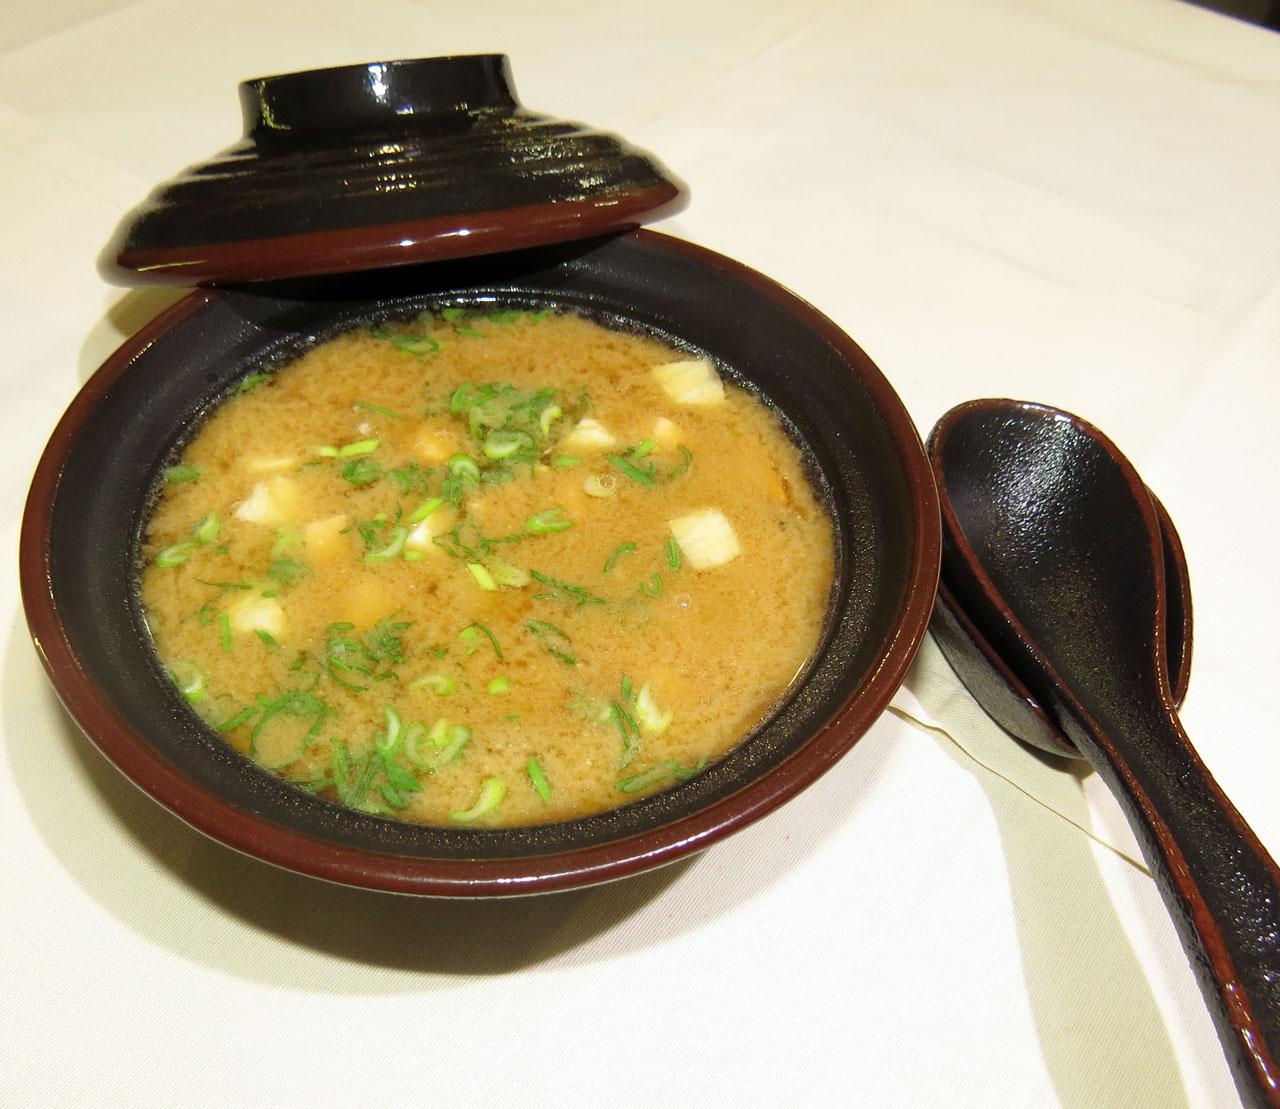 Кайсен Мисо Ширу Мисо суп с морепродуктами. Ресторан Аннам Брахма в Оренбурге